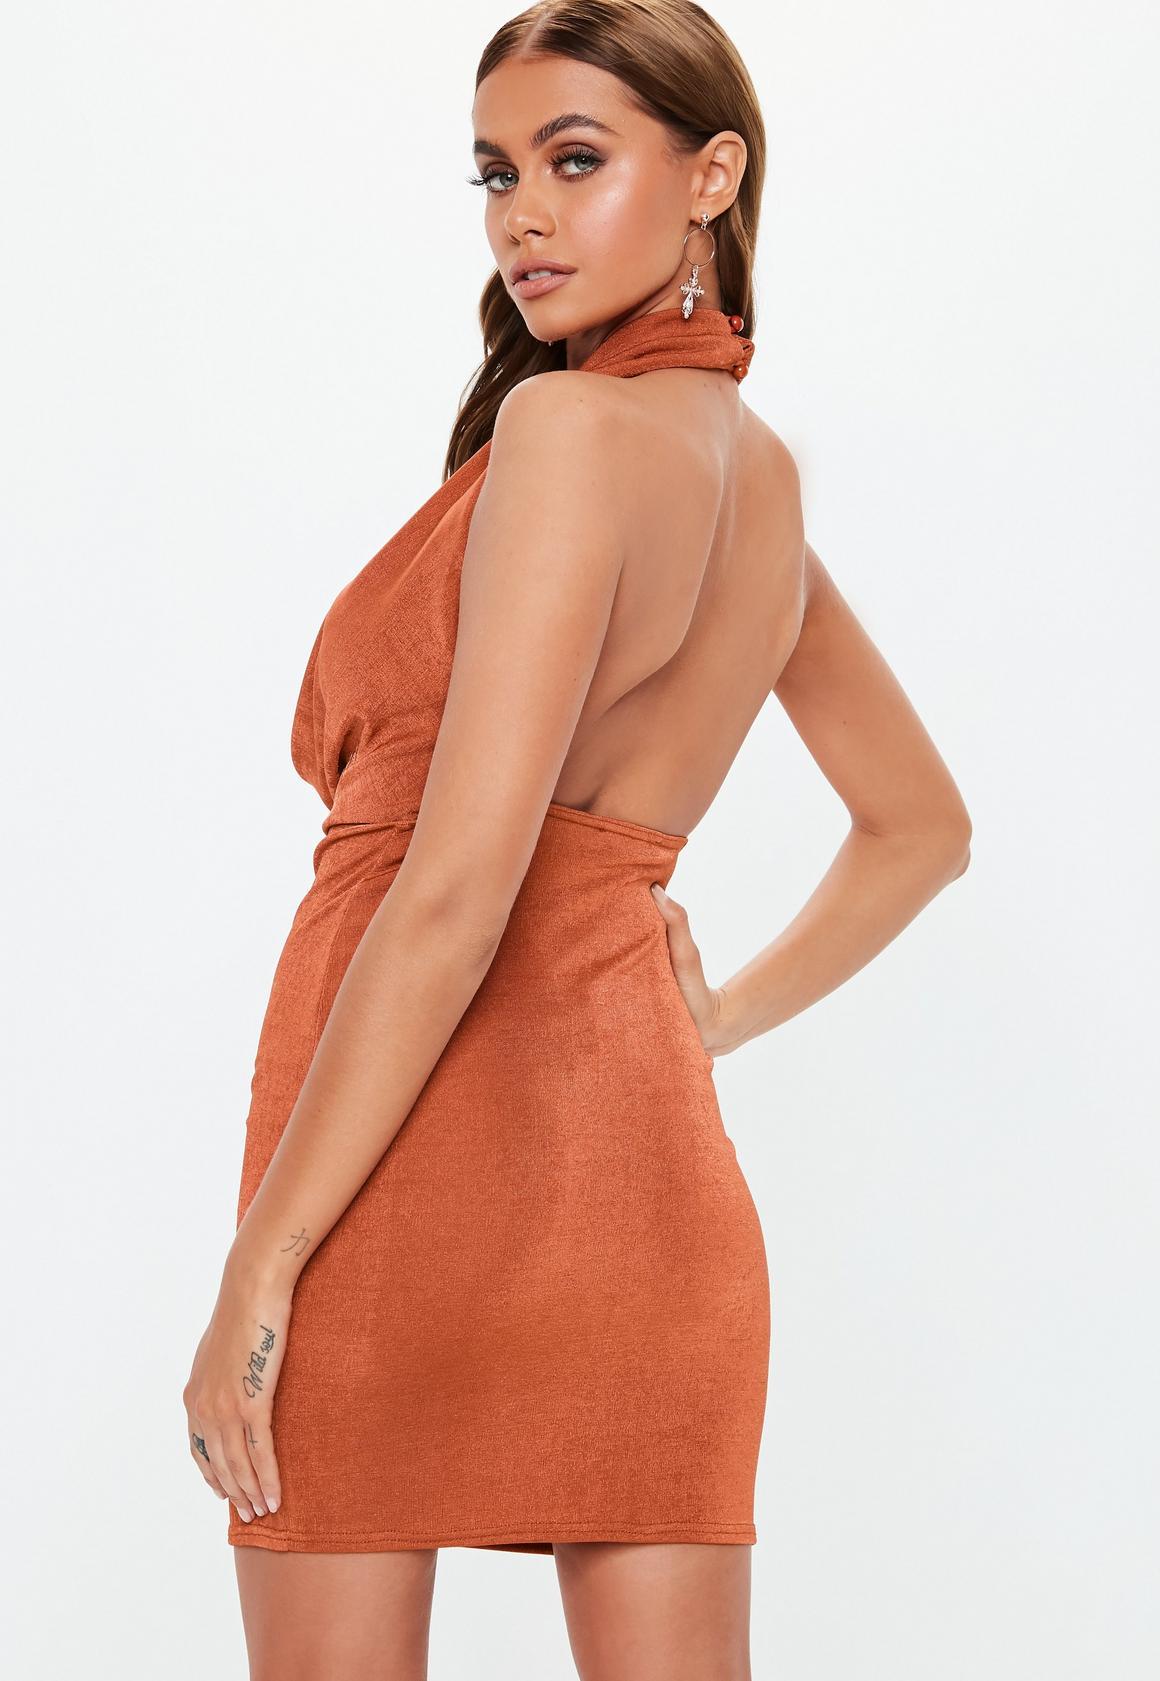 Missguided - robe courte dos-nu  à col bénitier - 4